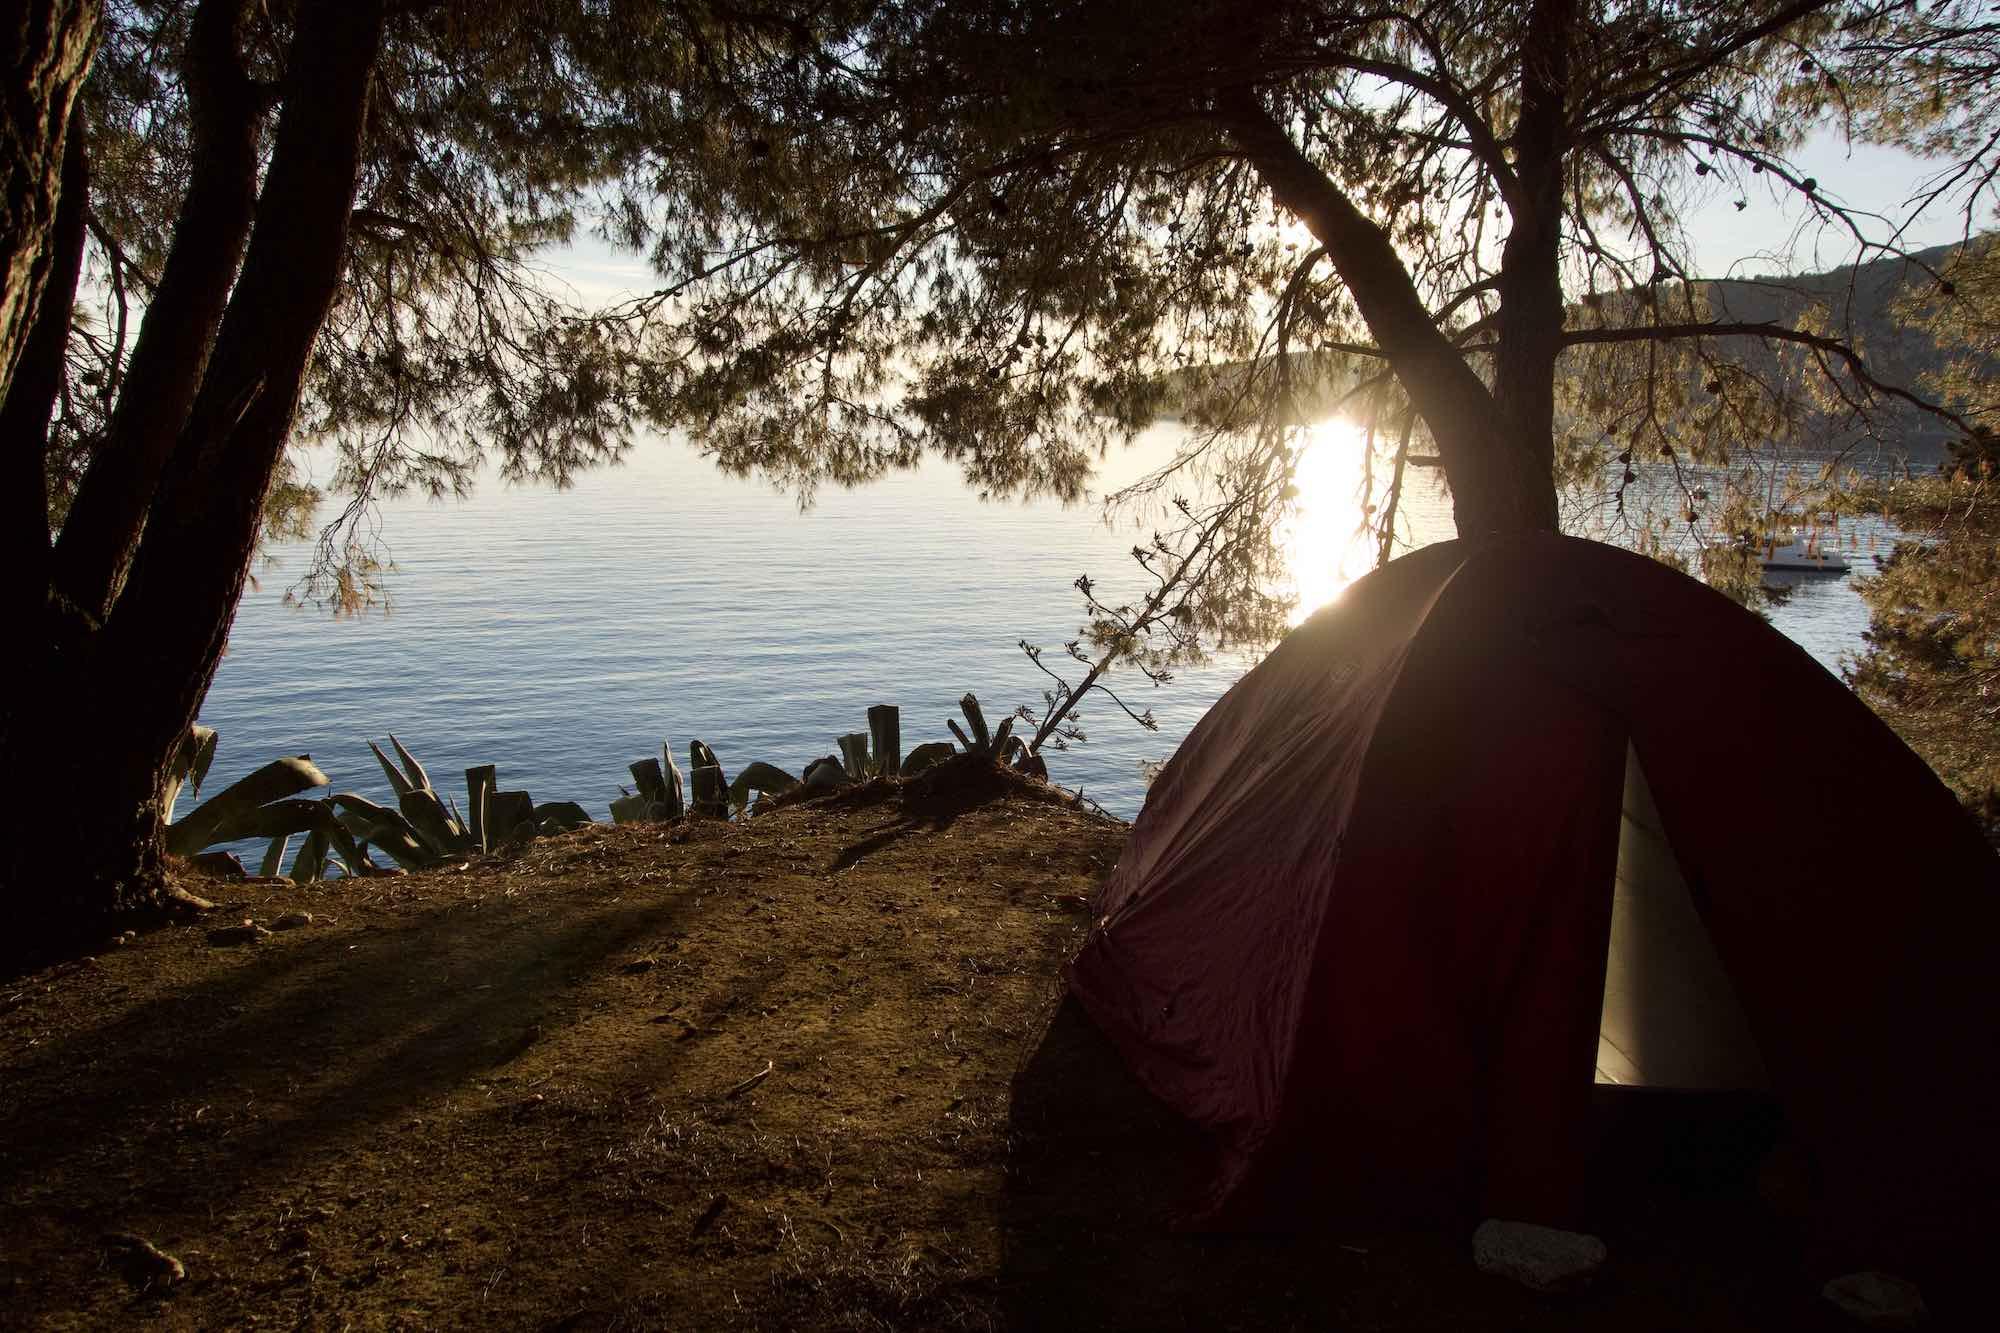 Camping in Kamenice Komiza